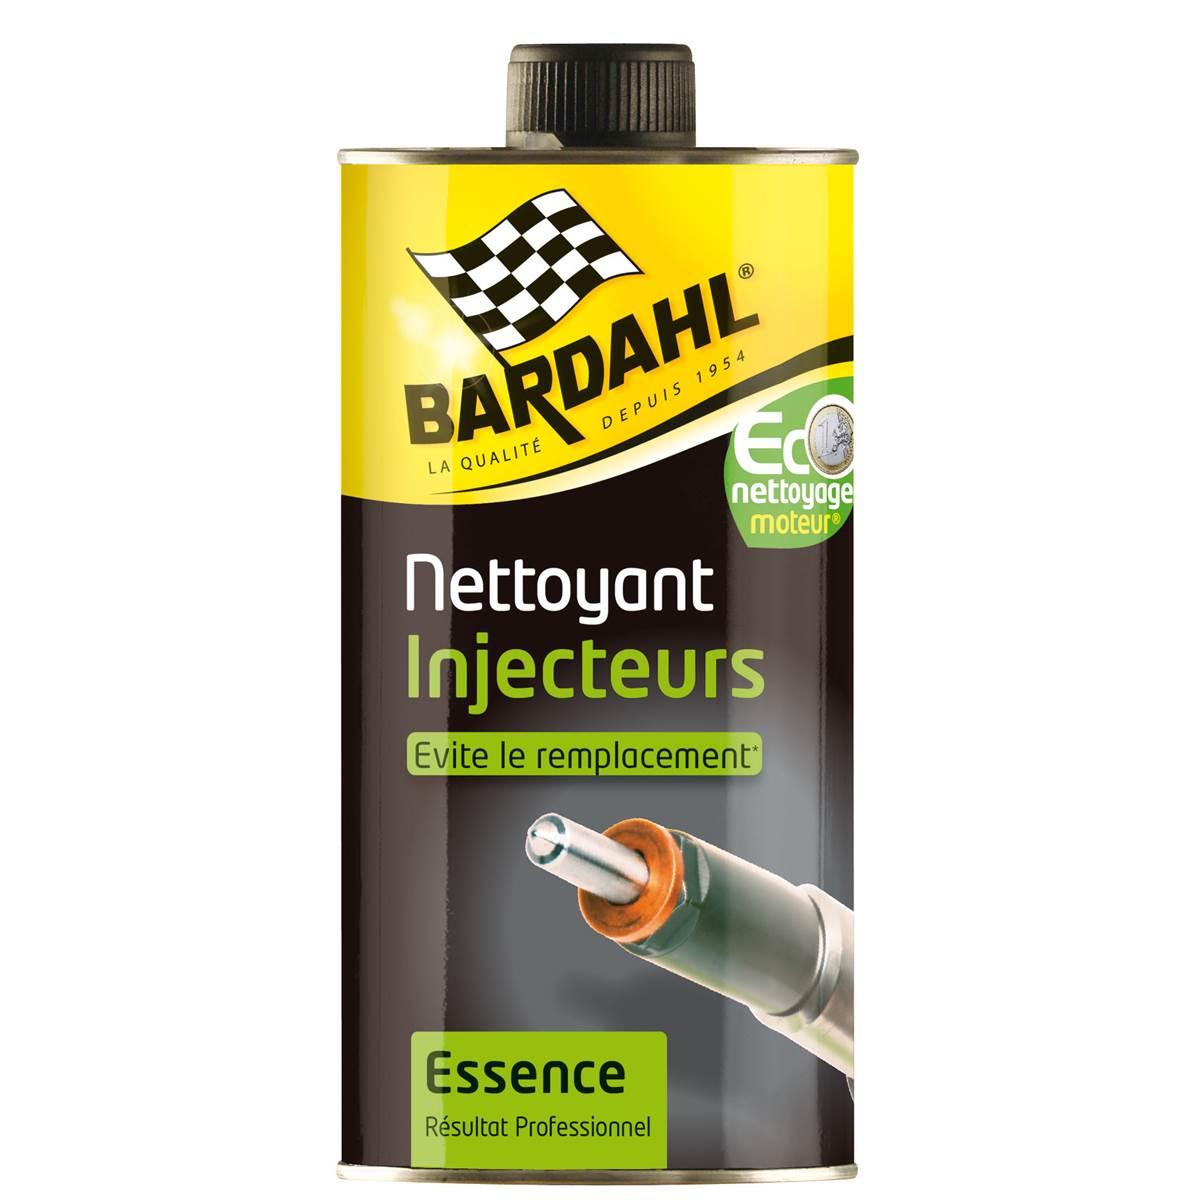 Nettoyant injecteurs Essence Bardahl - 1L